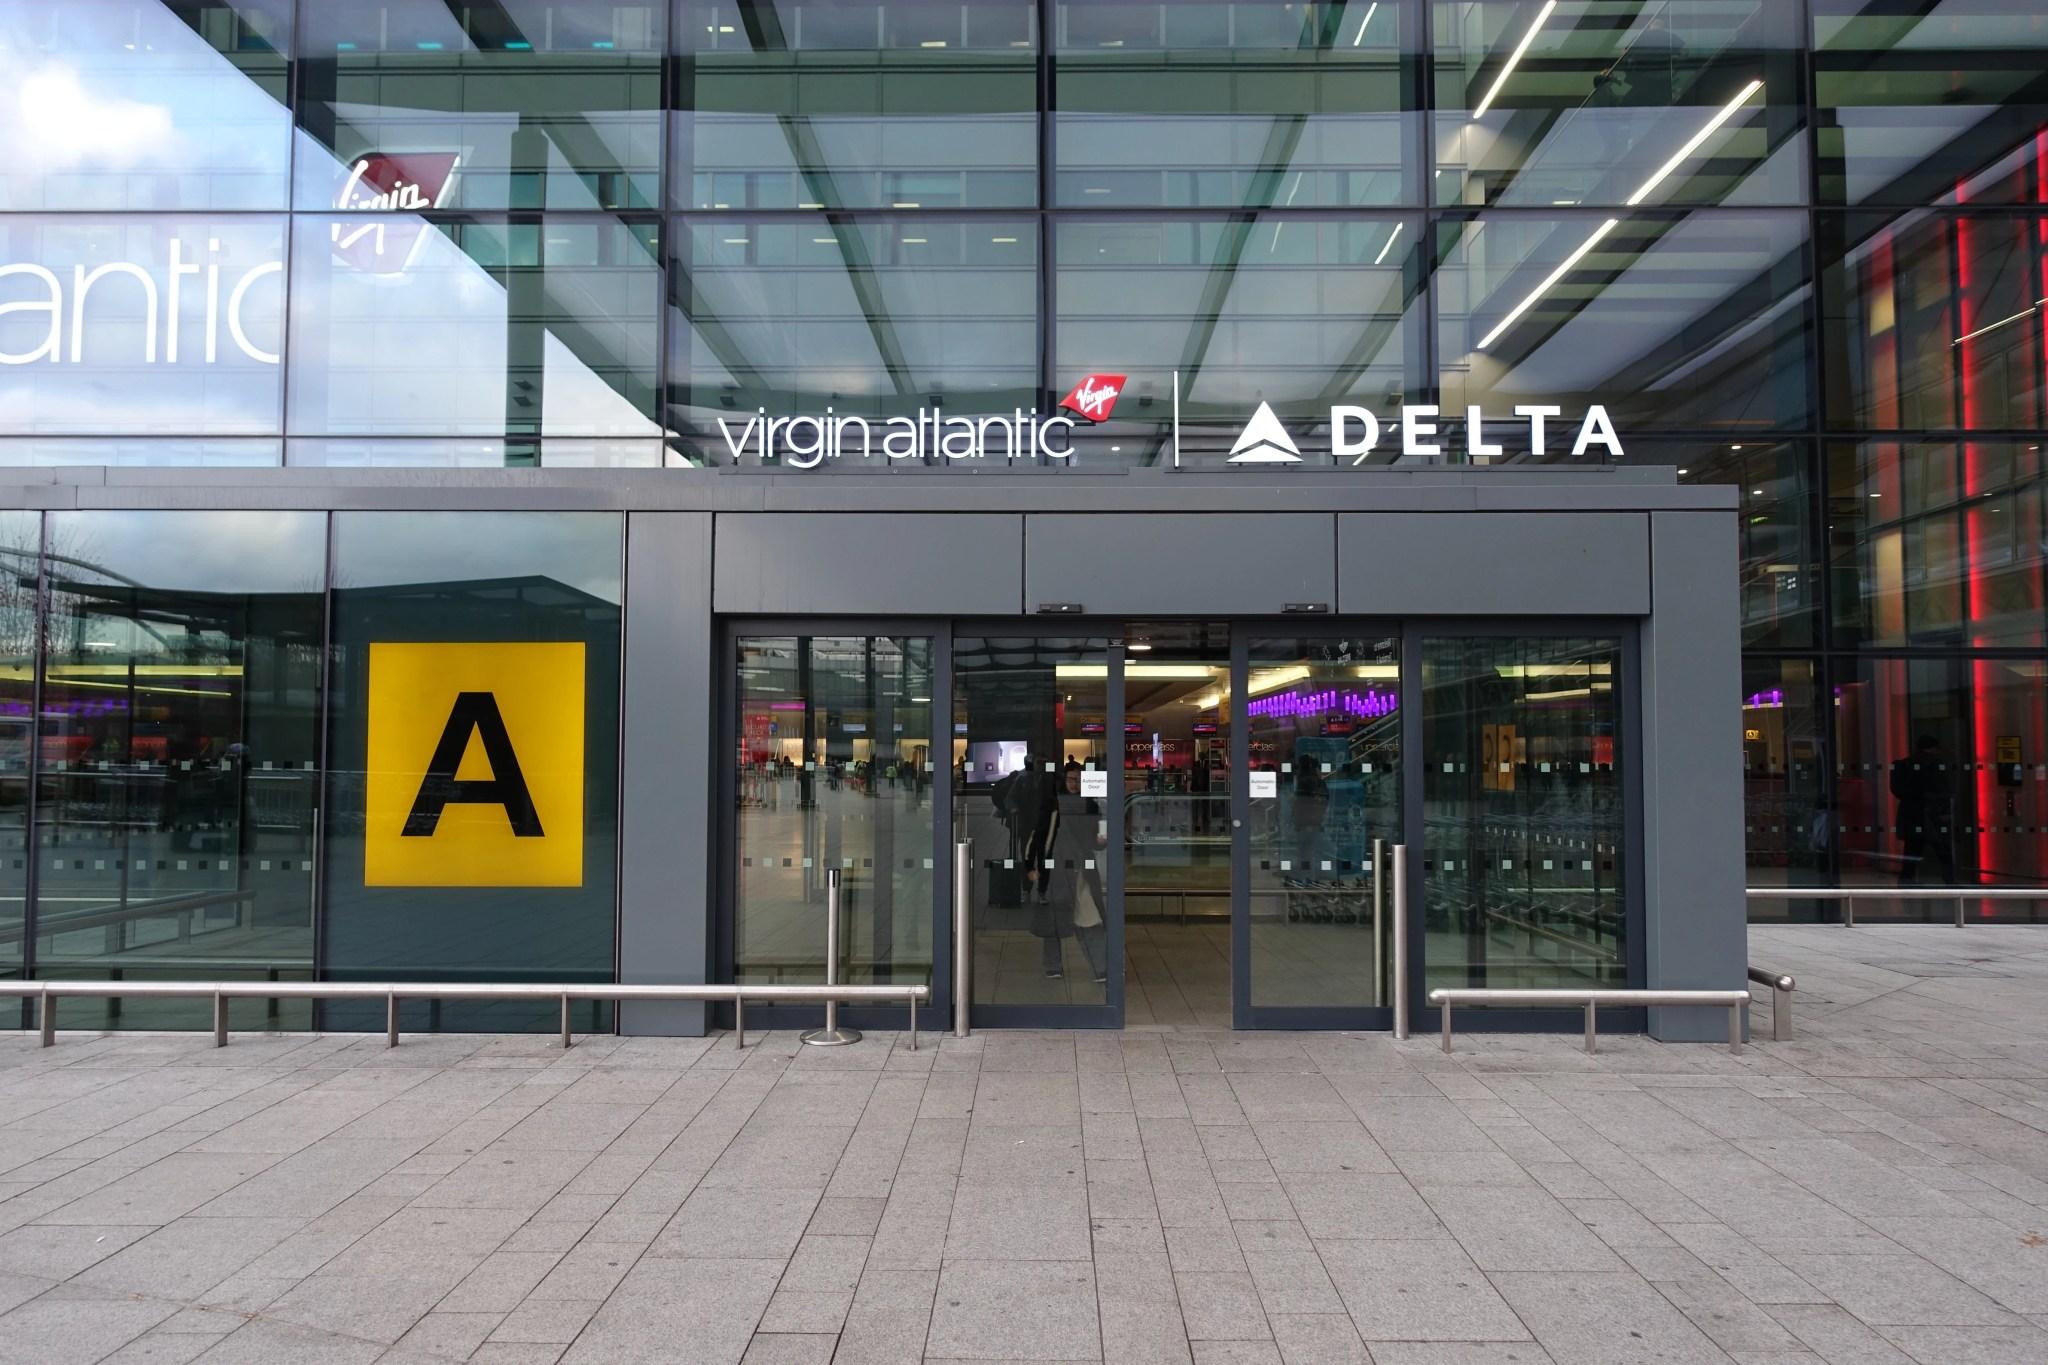 Virgin Atlantic Upgrade >> Review: Virgin Atlantic (787-9) Premium Economy, LHR to EWR